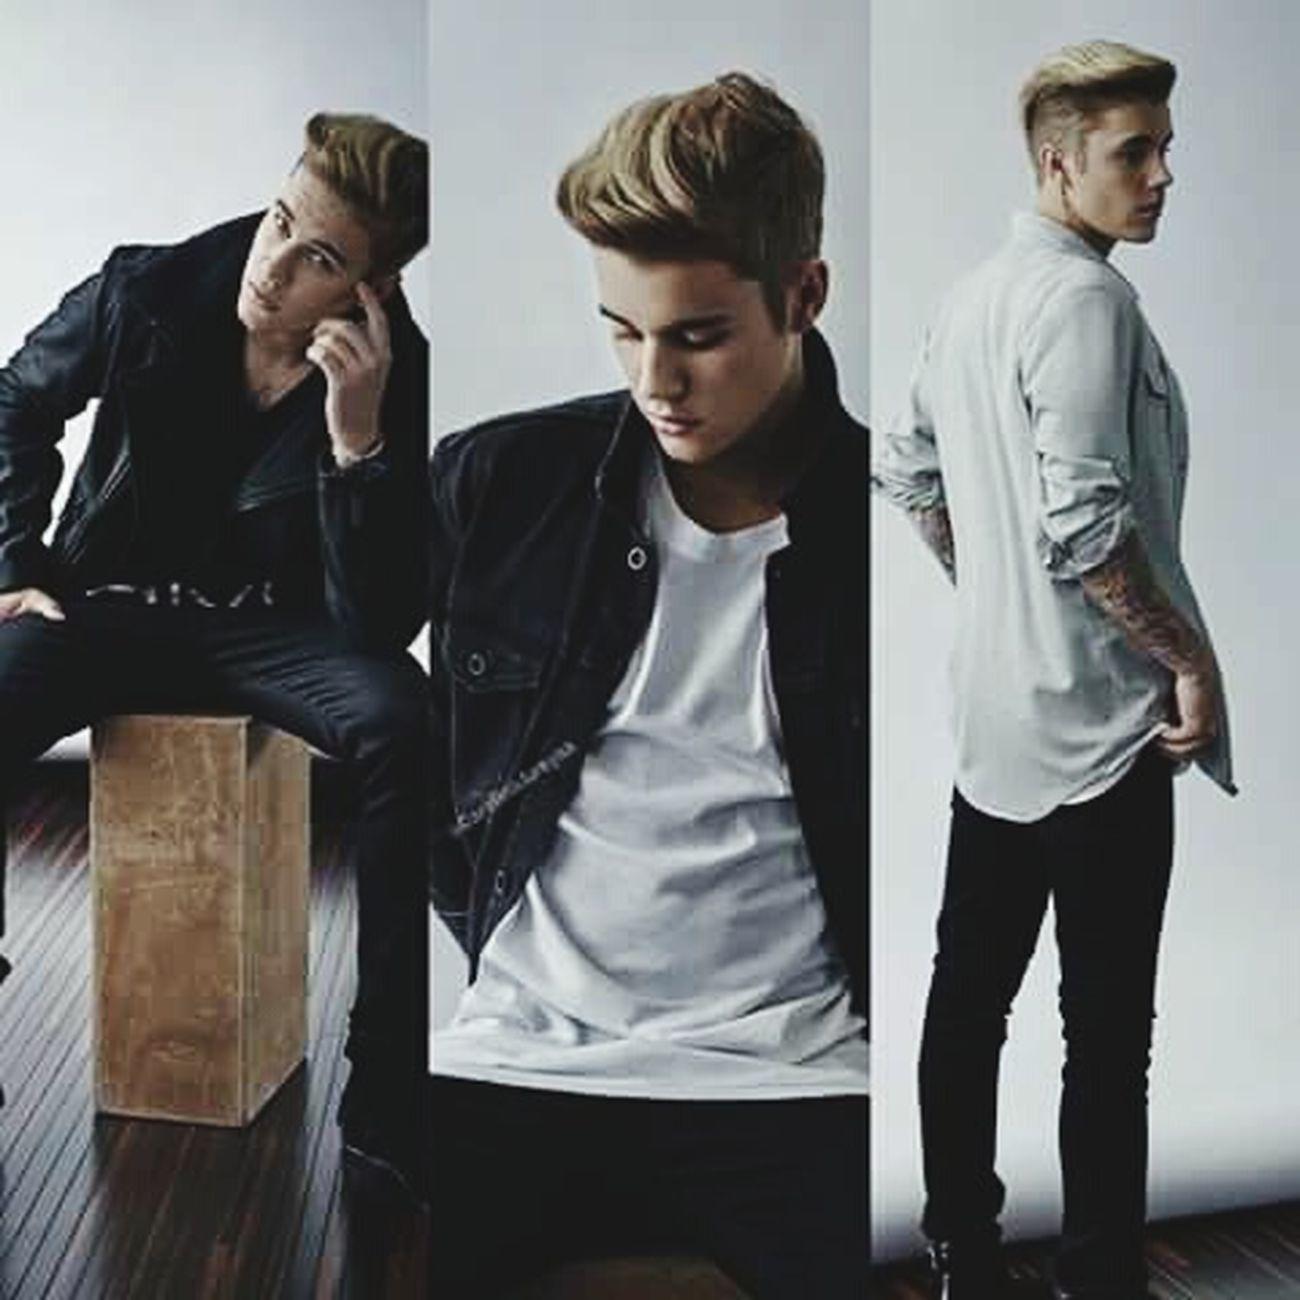 Perfection😍😘👌🐧 He is mine! Love ♥ Hello World Justin Bieber ♥ Justinbieber Justin Bieber <3 Beliebers I'm A Belieber ❤ JustinDrewBieber